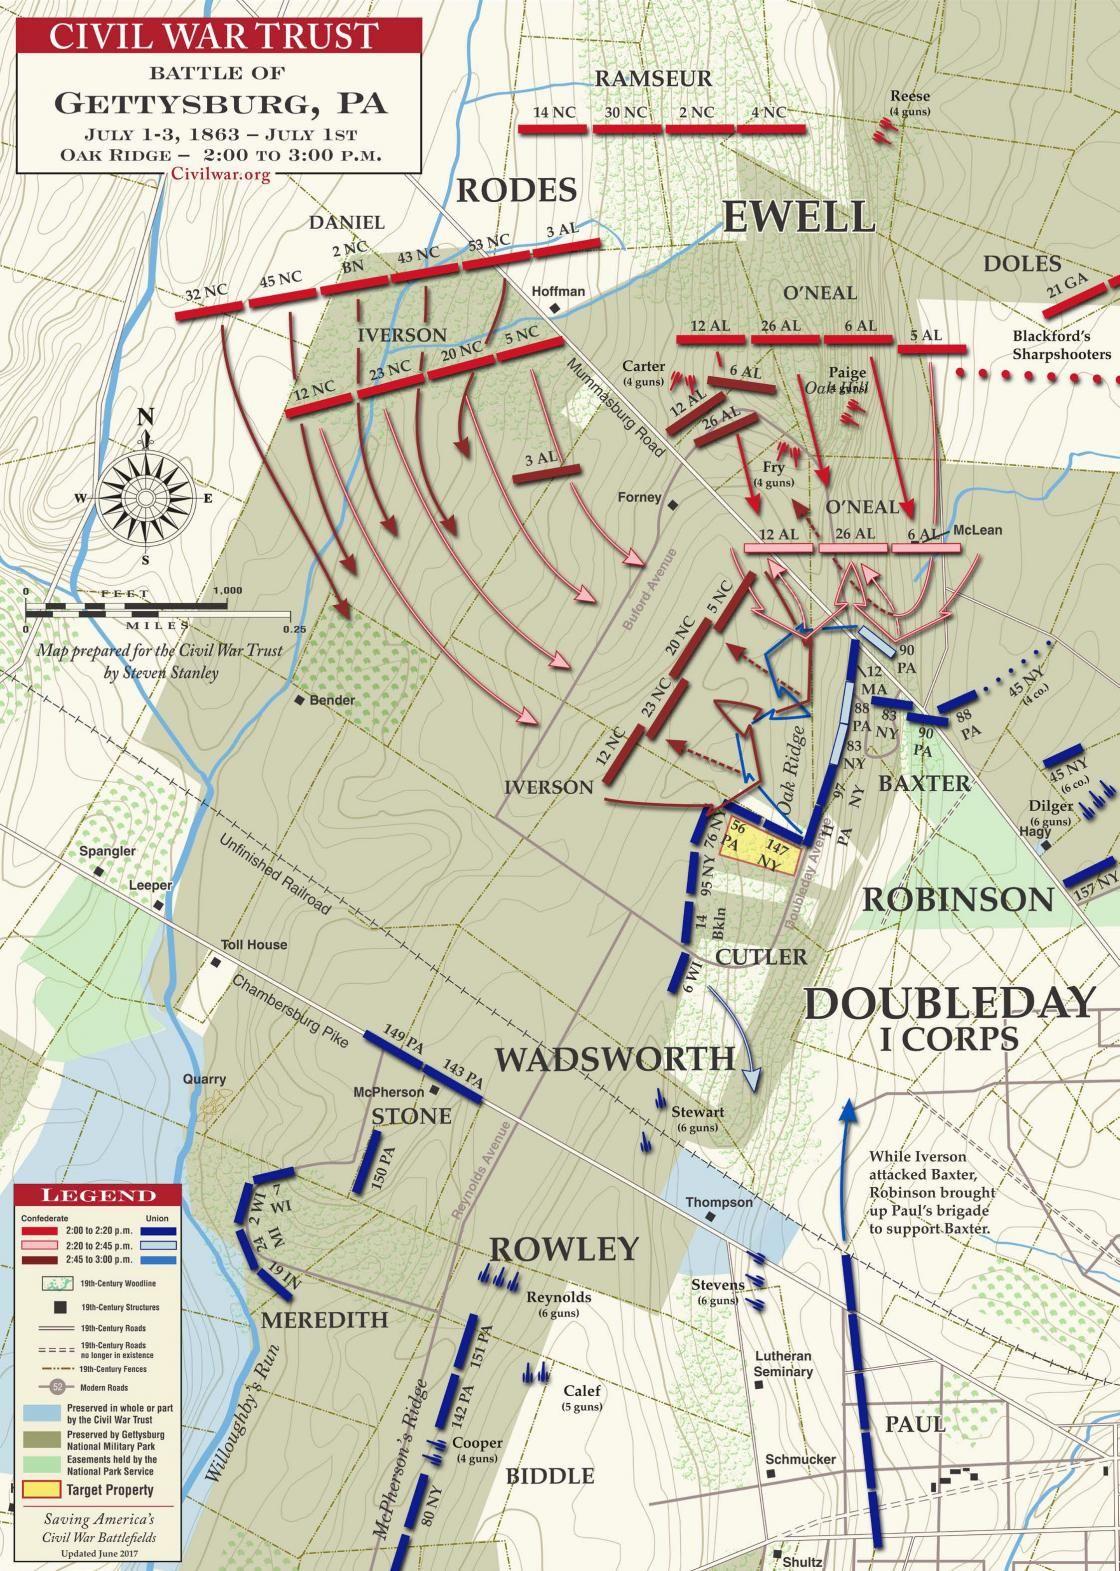 Oak Ridge Nc Map.Gettysburg Oak Hill And Ridge 2 00 3 00pm Civil War Battle